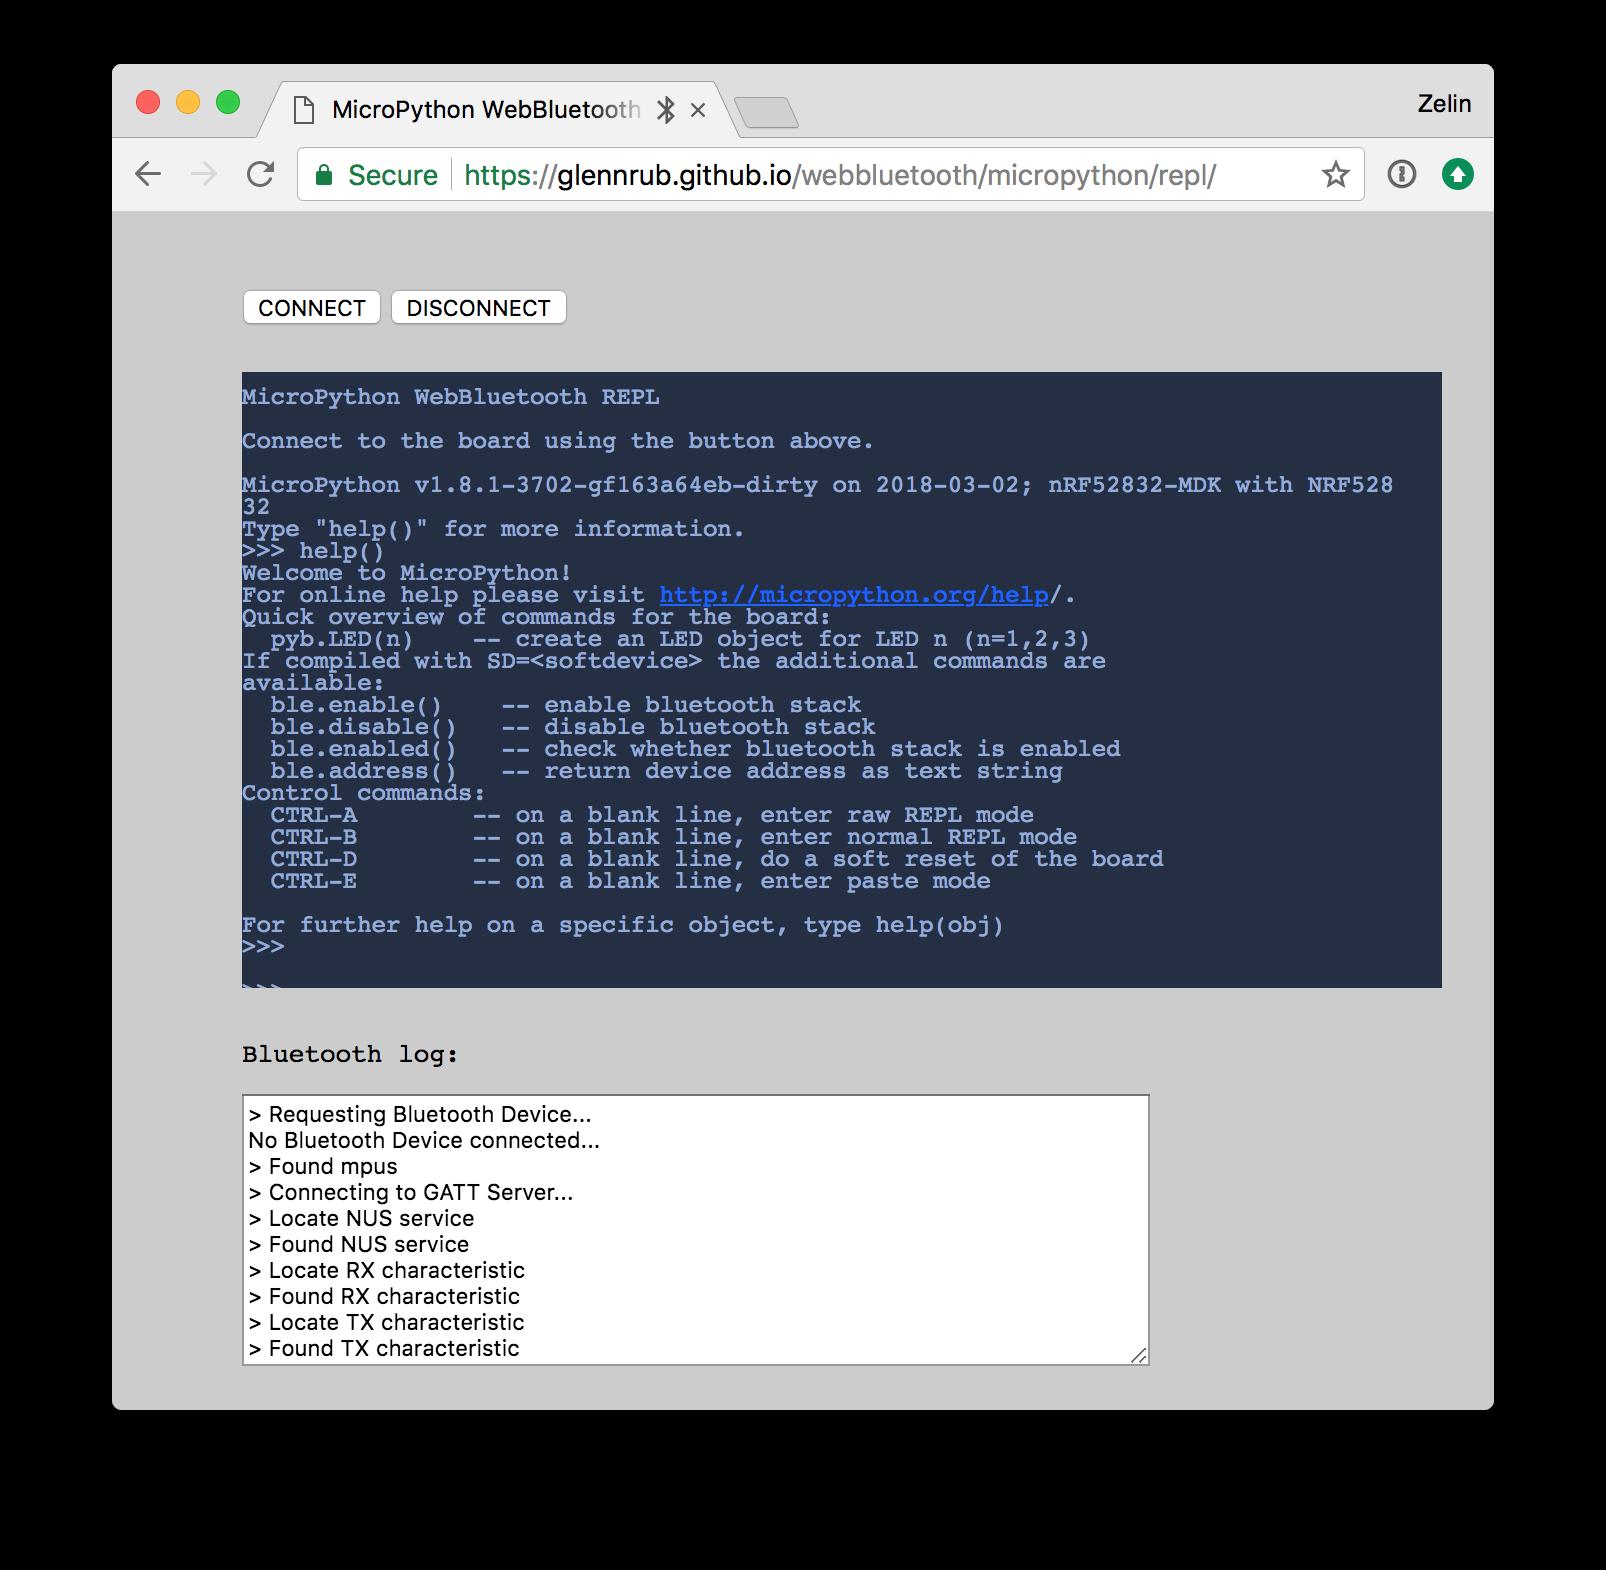 MicroPython - nRF52832-MDK Documentation